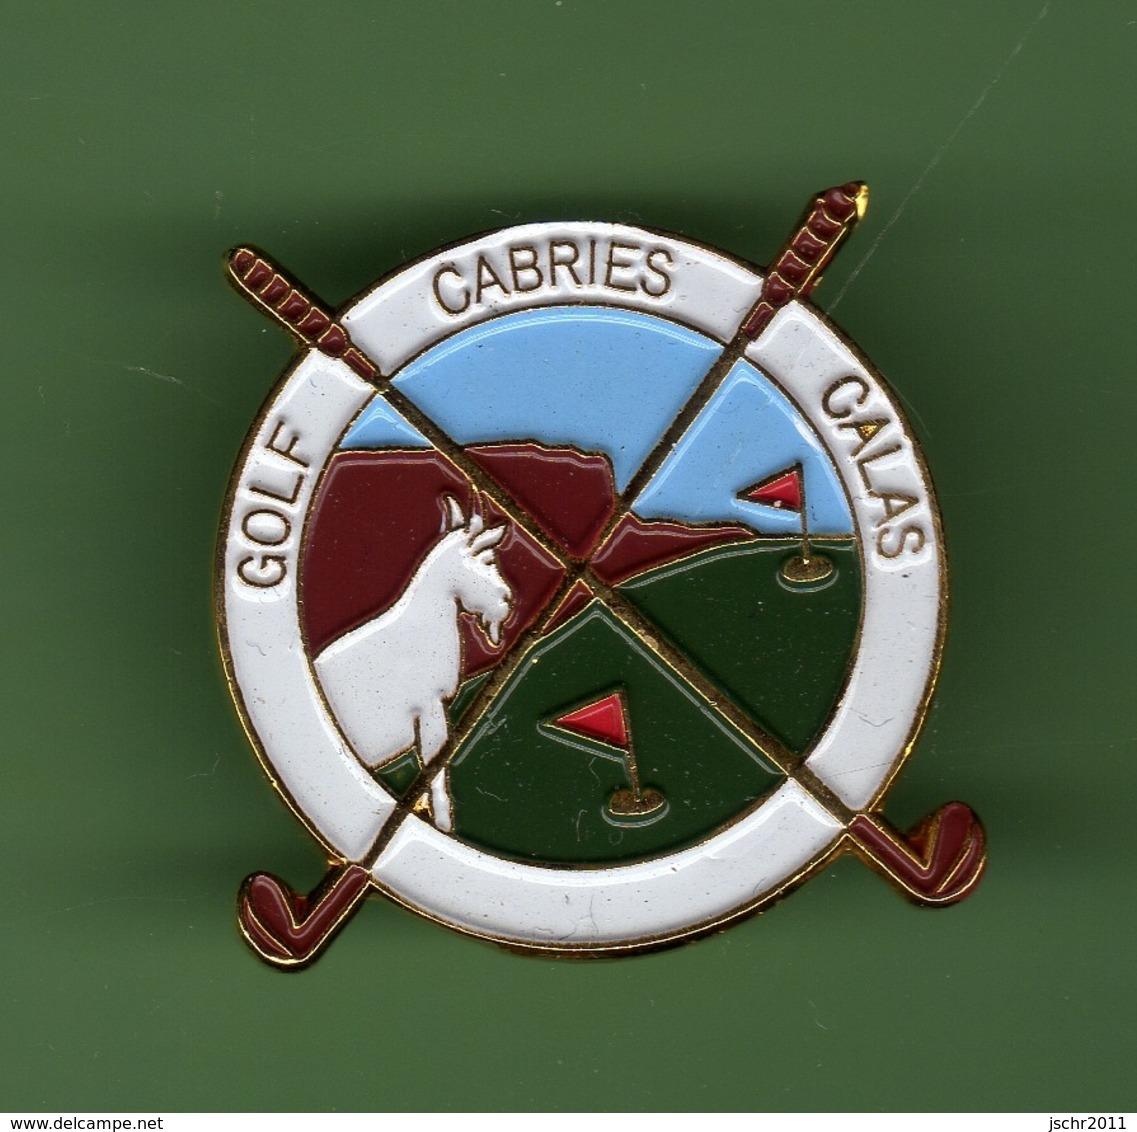 GOLF *** CABRIES-CALAS ***  2004 (80-2) - Golf